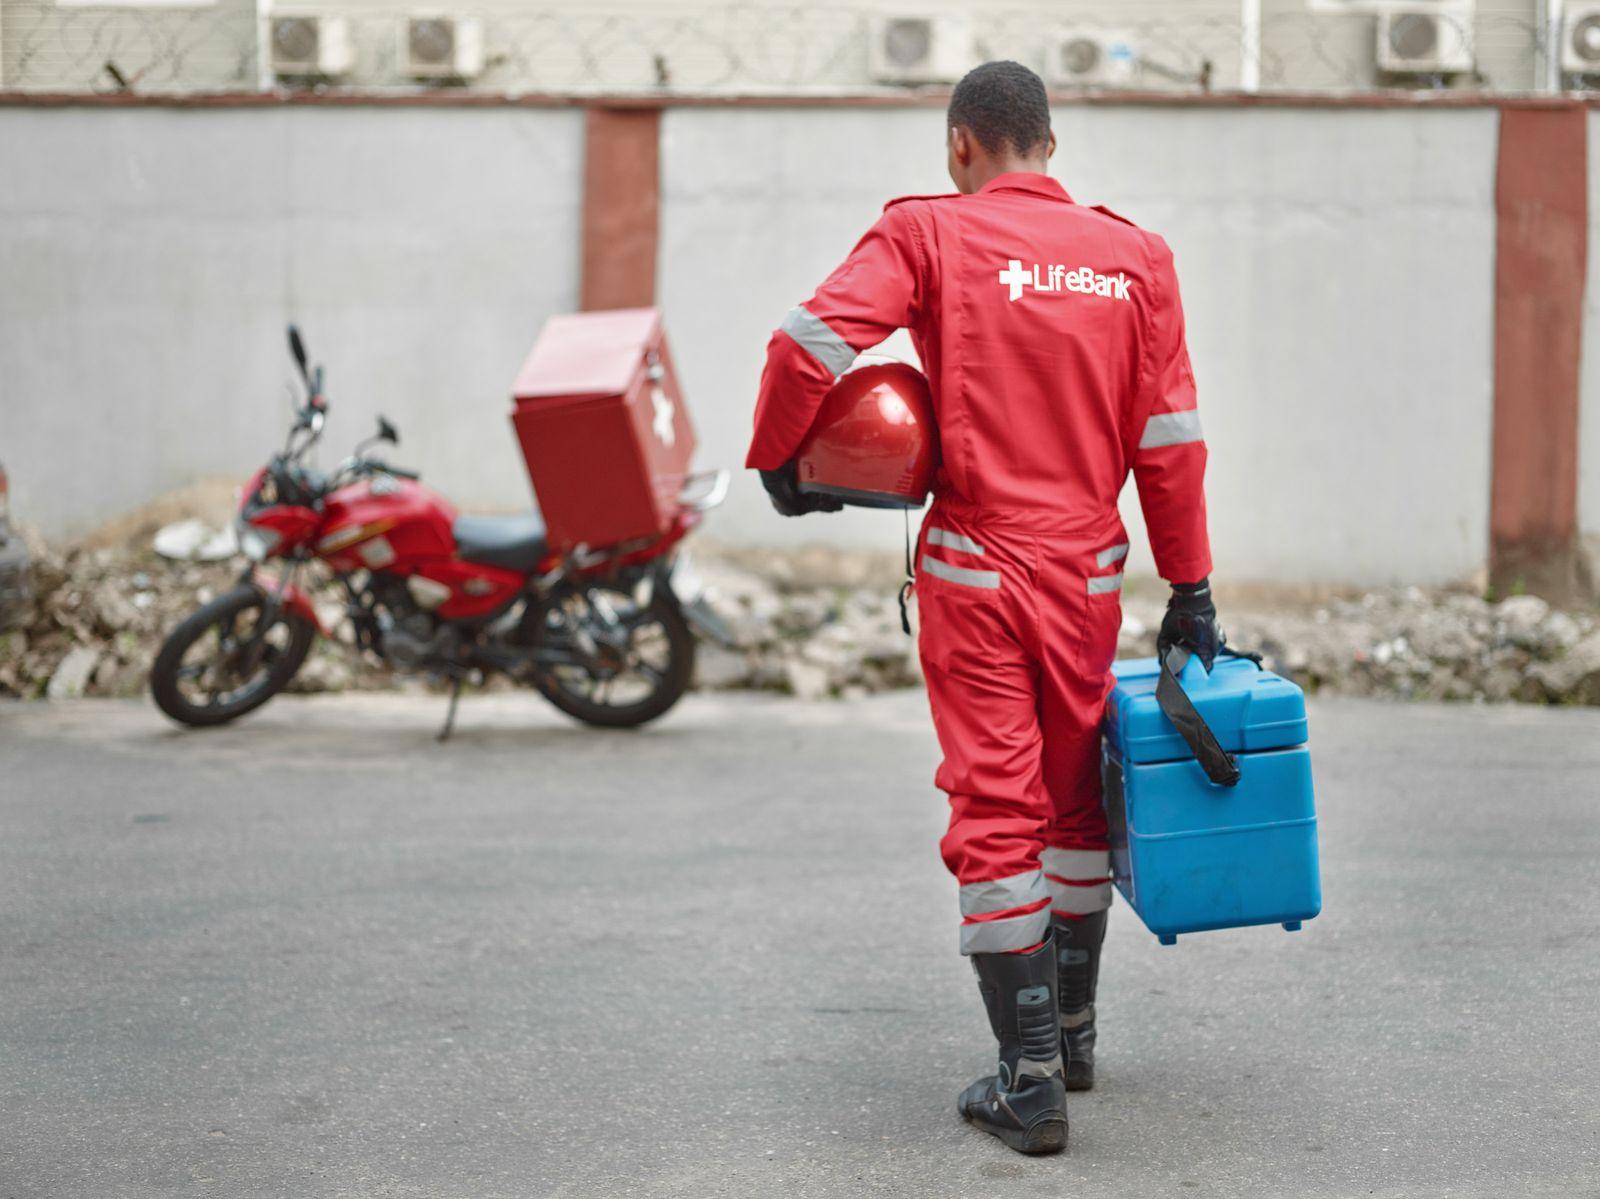 EINMALIGE VERWENDUNG Nigeria / LifeBank